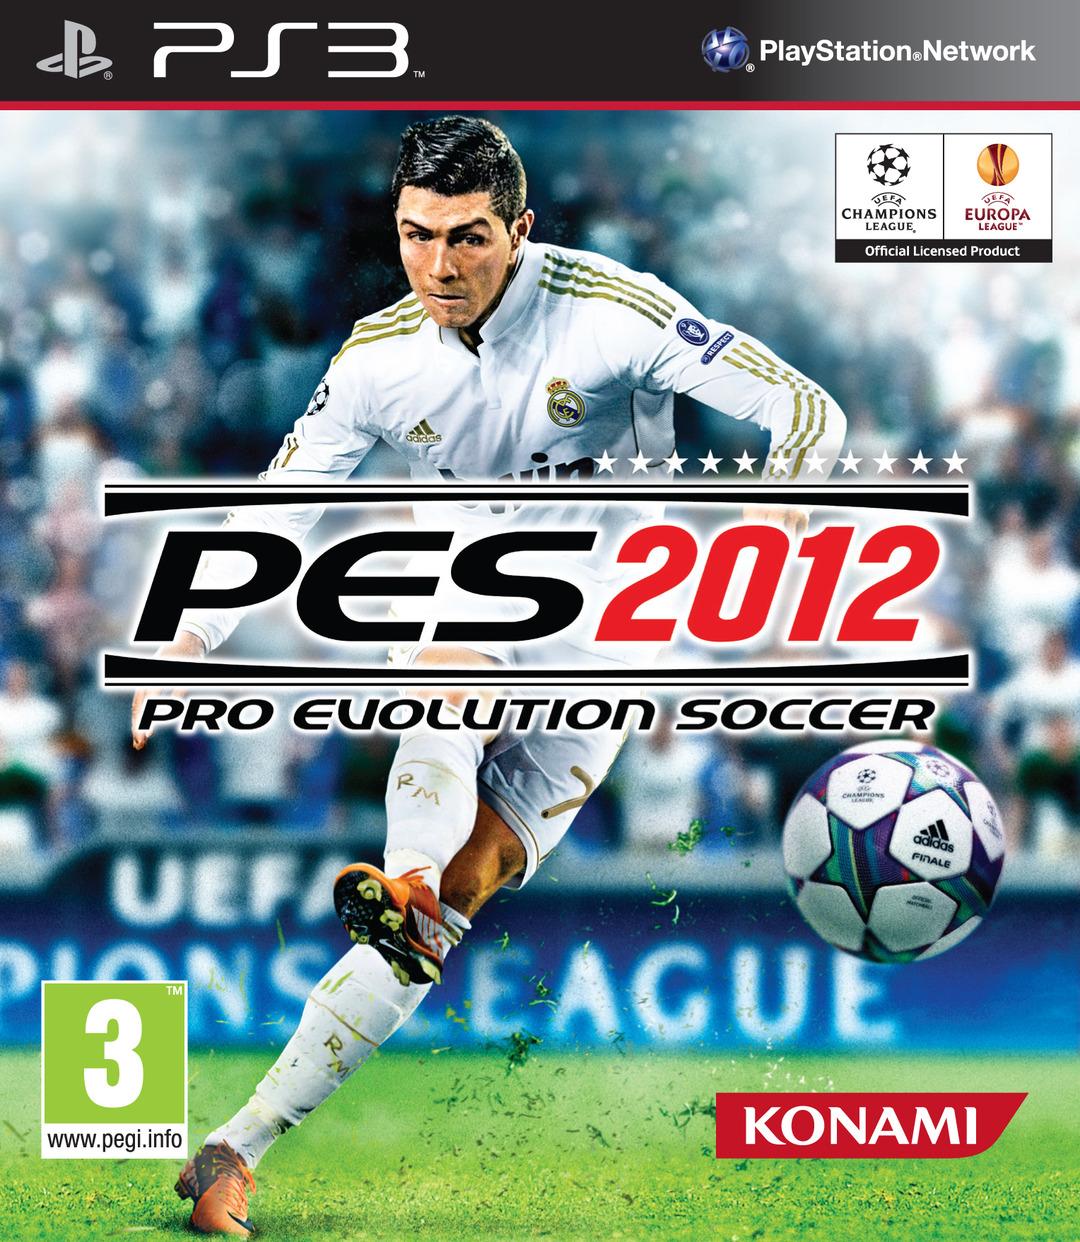 PS3 [Exc][3.55] Pro Evolution Soccer 2012